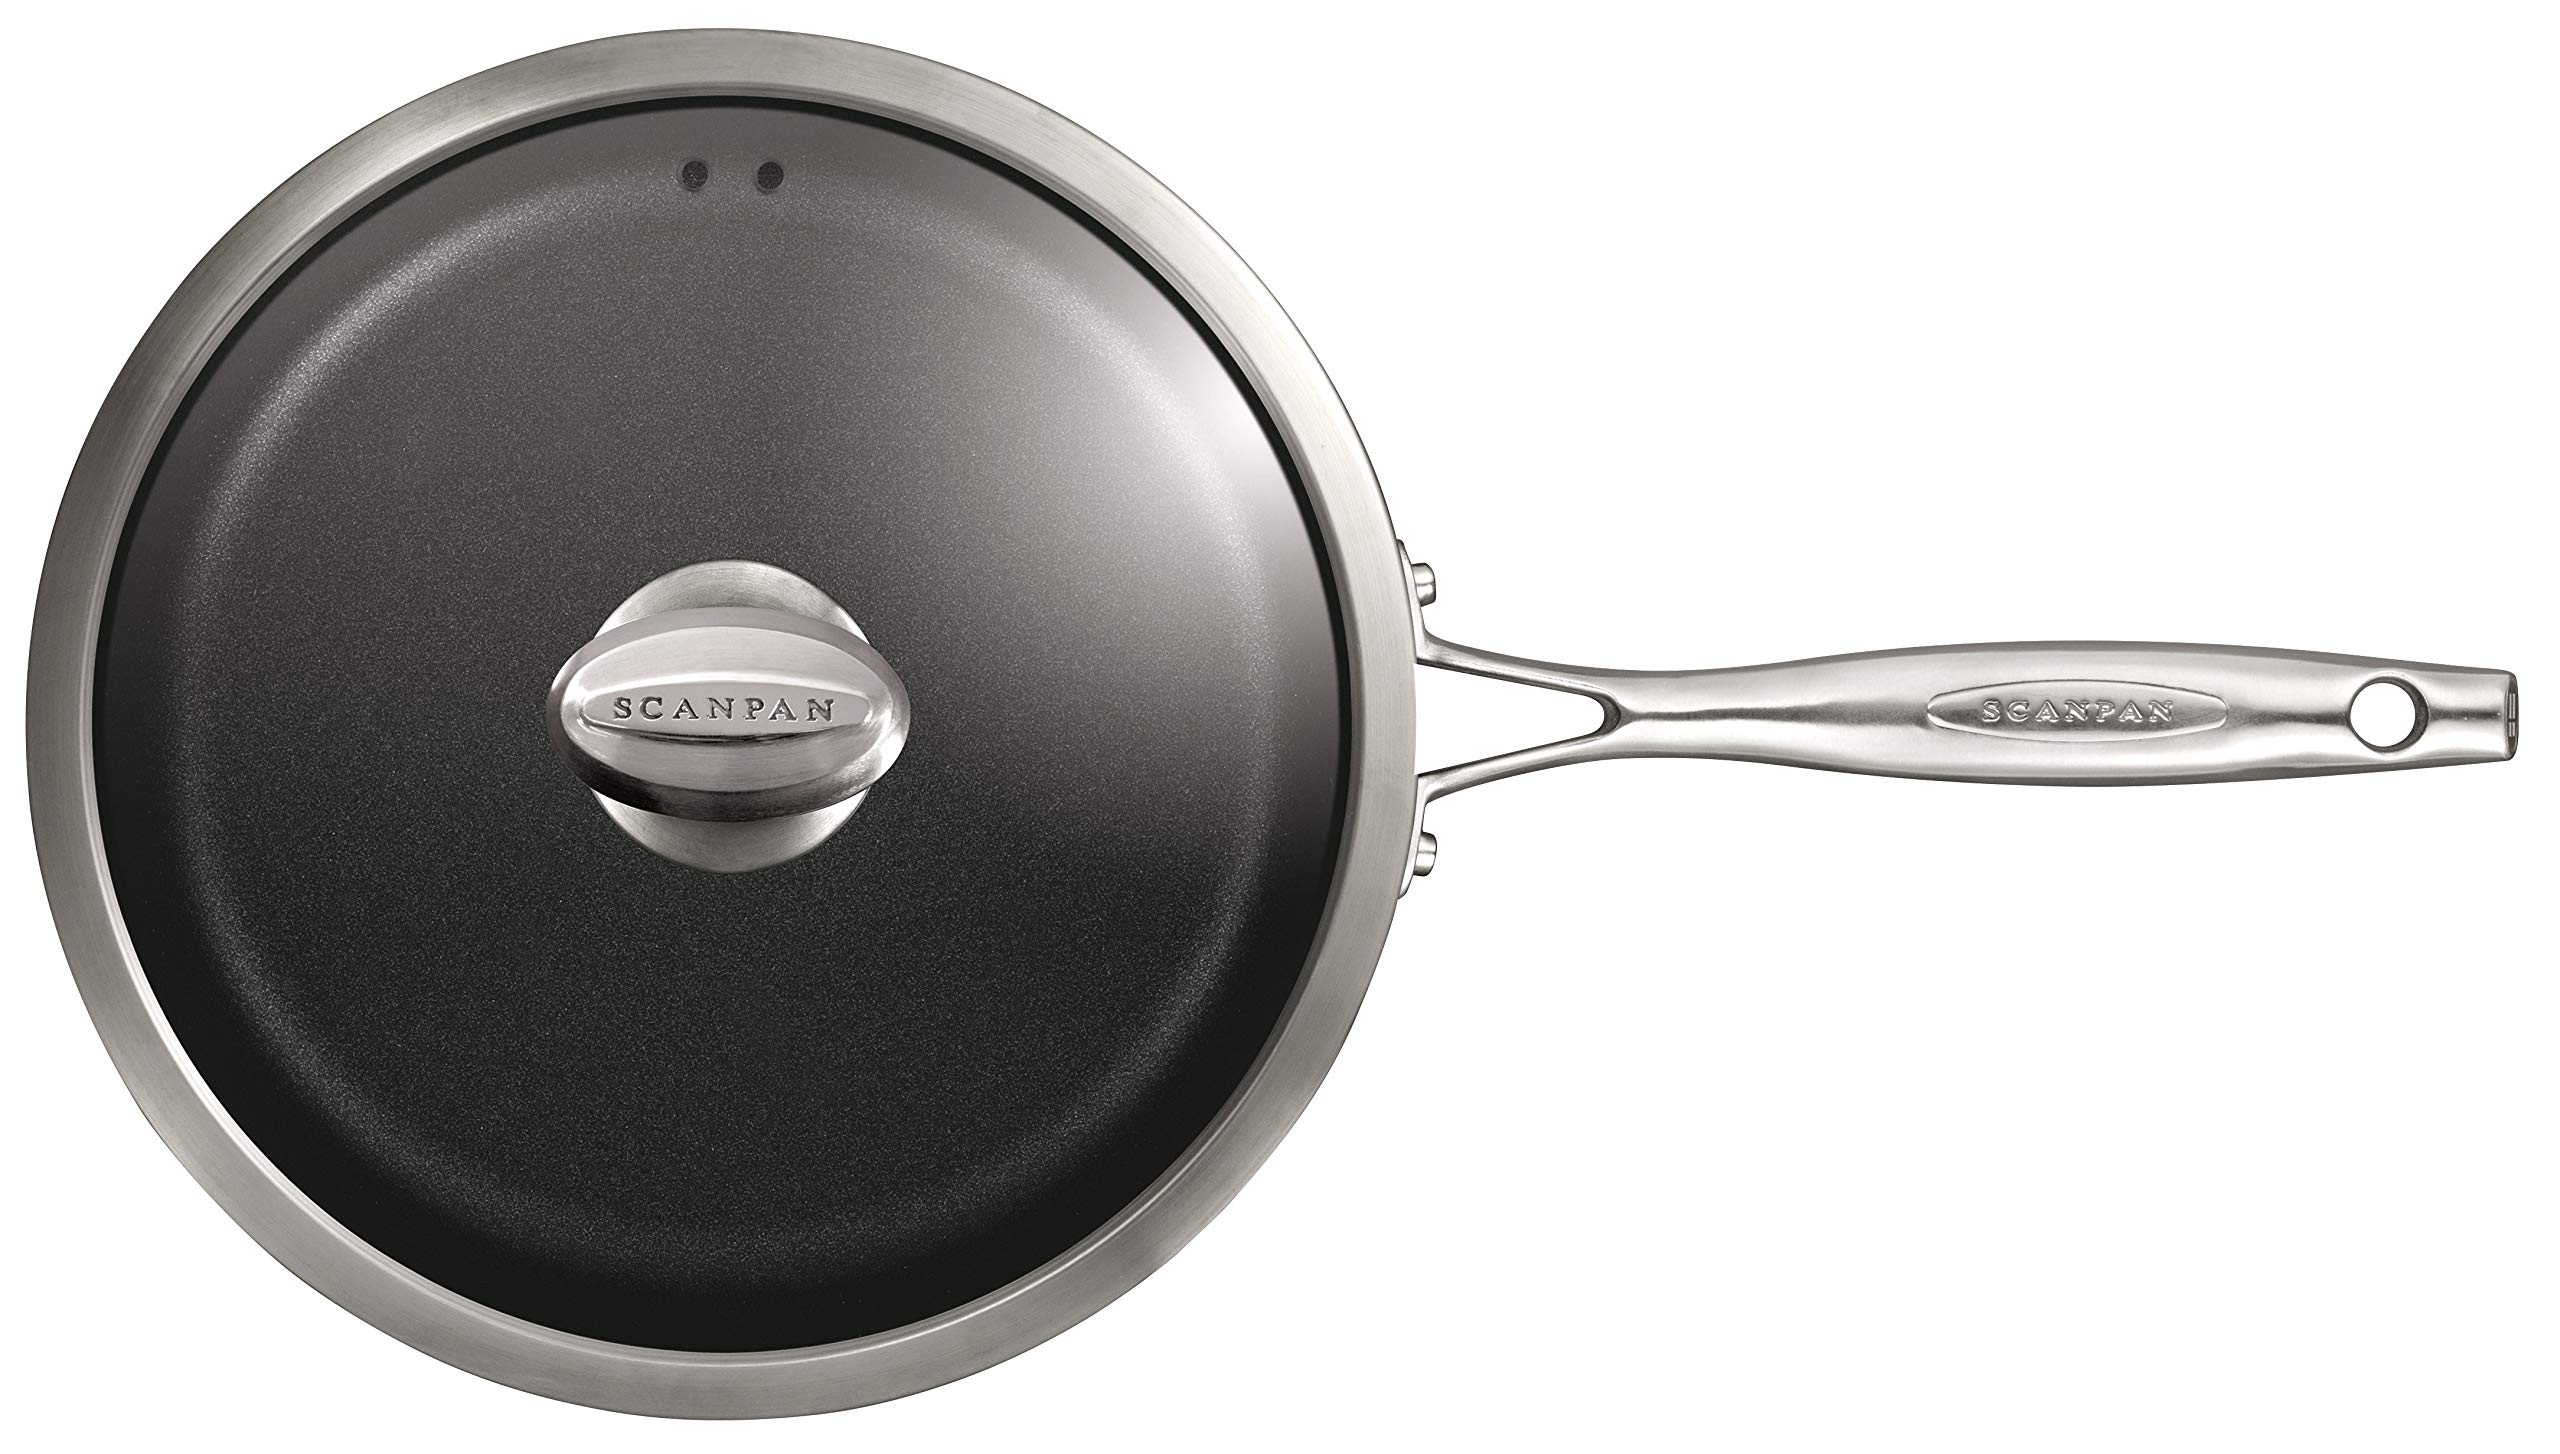 Scanpan PRO IQ Nonstick Covered Saute Pan, 2.75 quart, Black by Scanpan (Image #3)